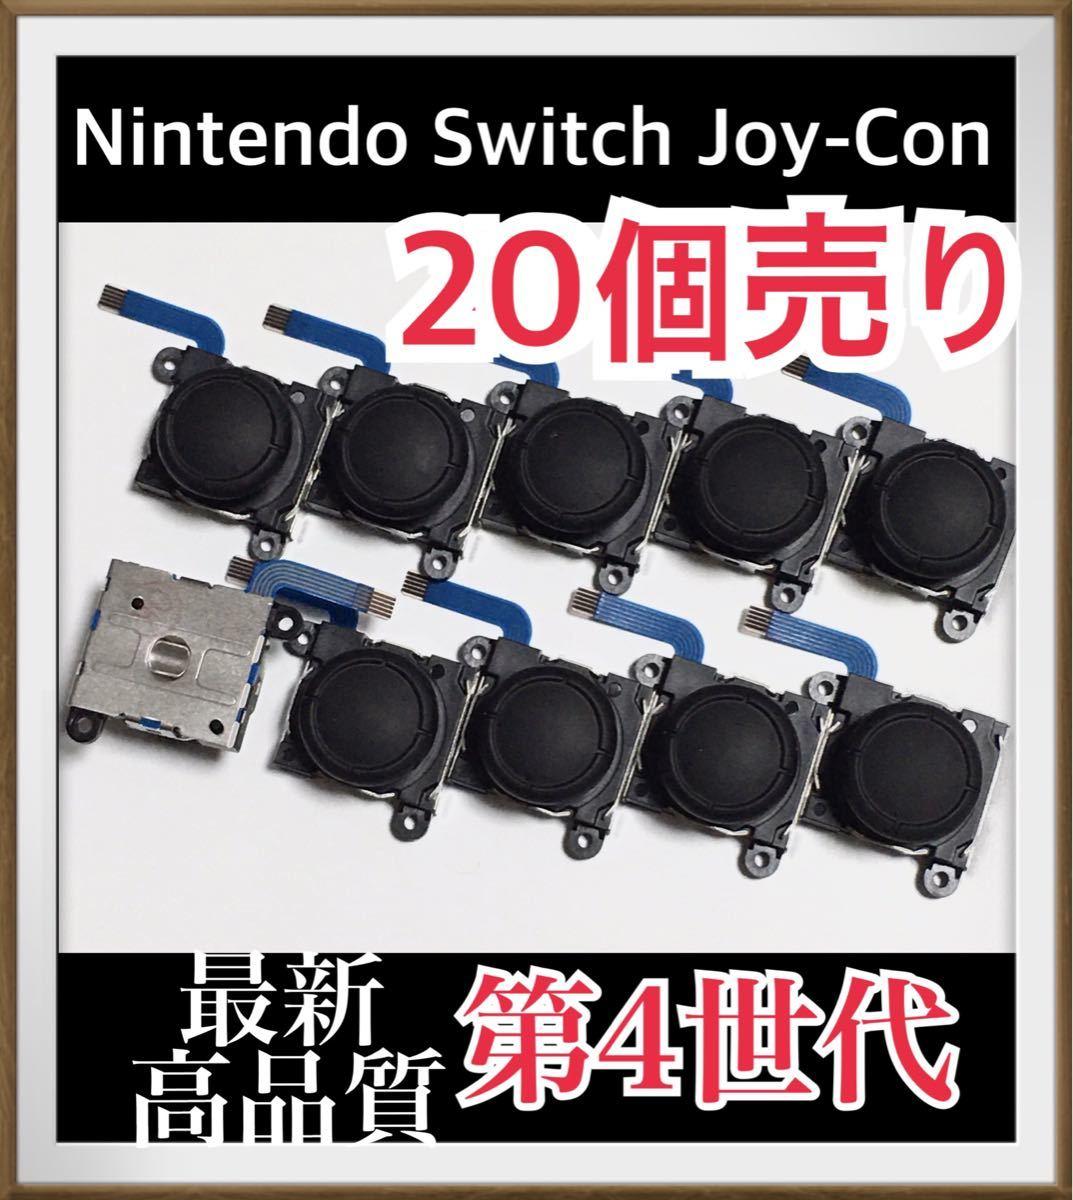 Nintendo Switch Joy-Con スティック 20個